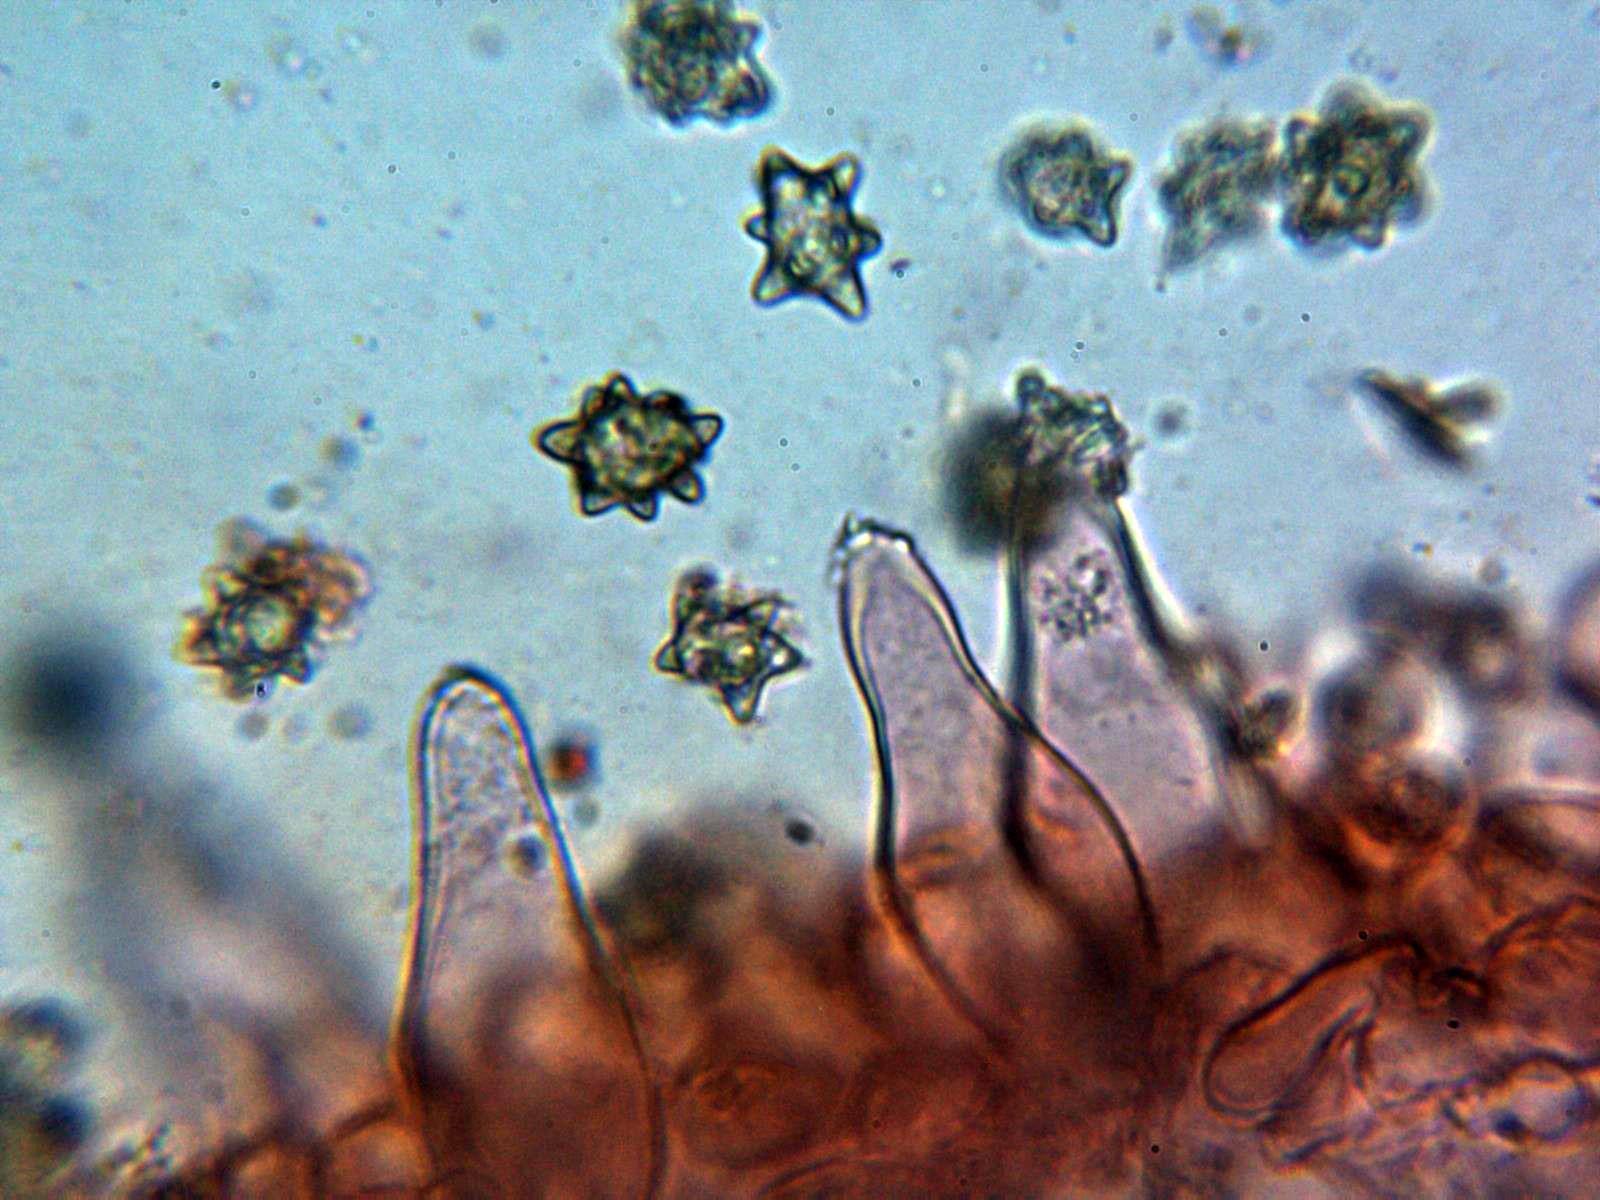 6-Queilocistidios2.jpg